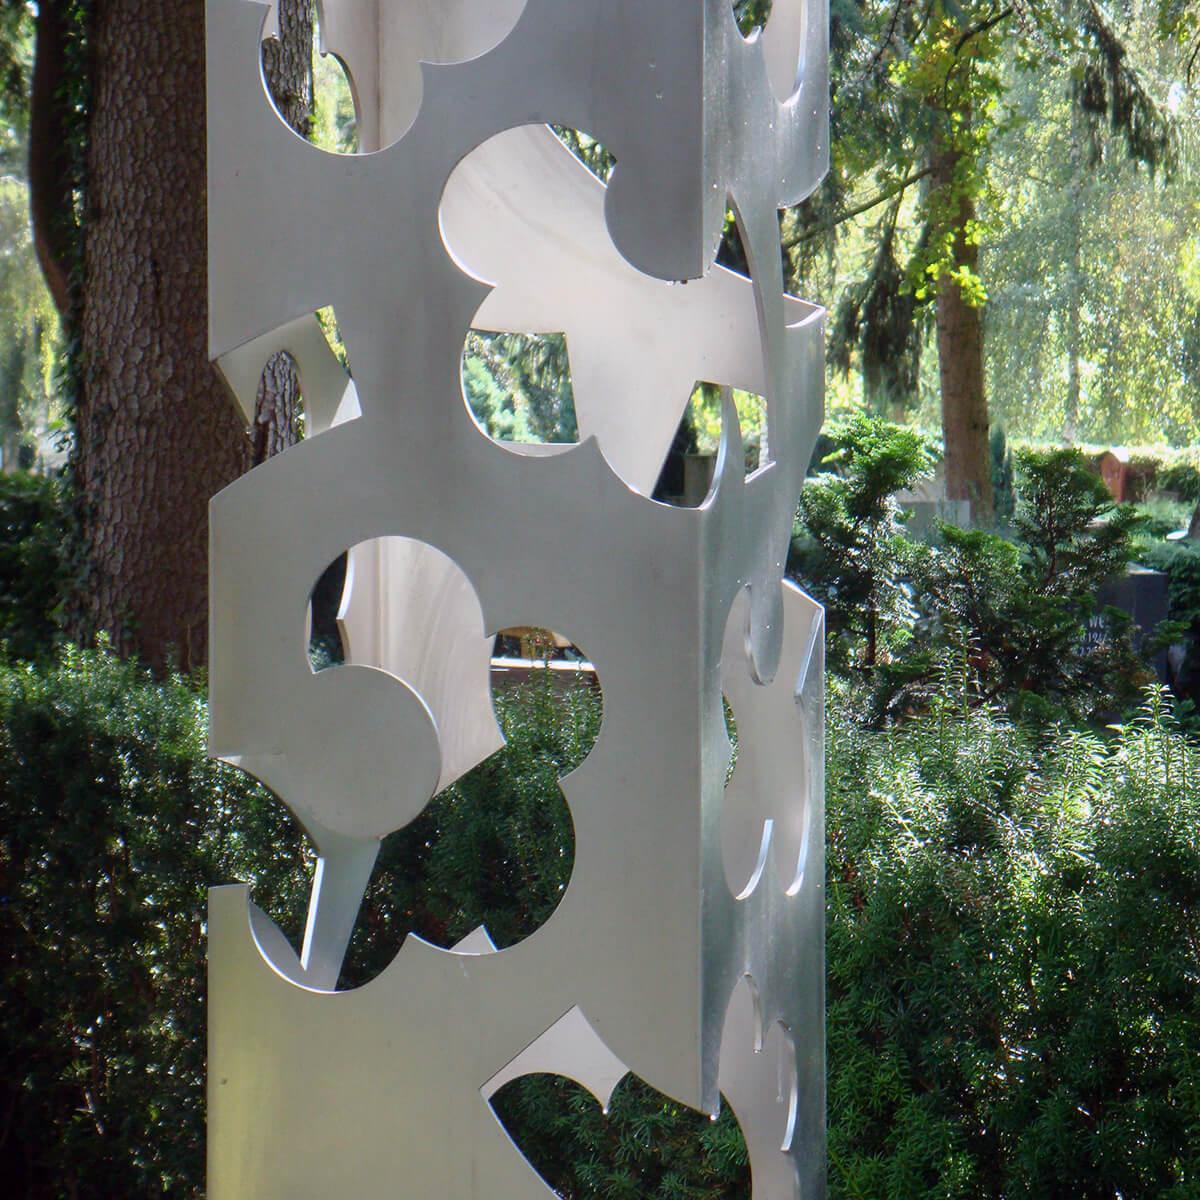 Barbara Jäger Malerei Skulptur Karlsruhe Blütenstele Hauptfriedhof Karlsruhe Kunstprojekt Aspekte